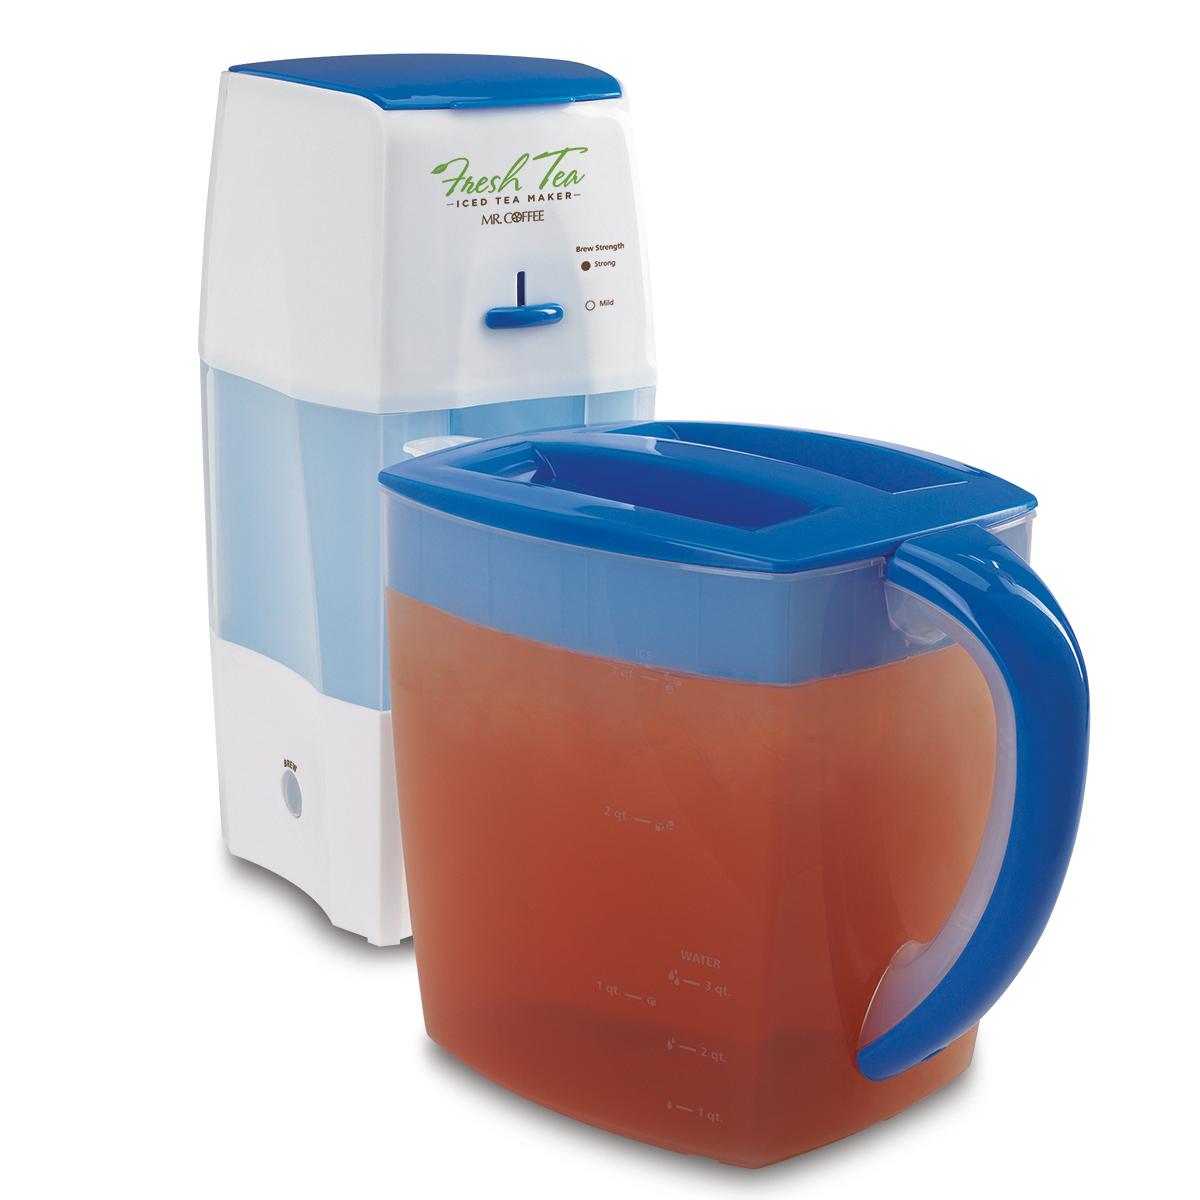 Mr Coffee 3 Quart Iced Tea Maker Black Tm75bk 1